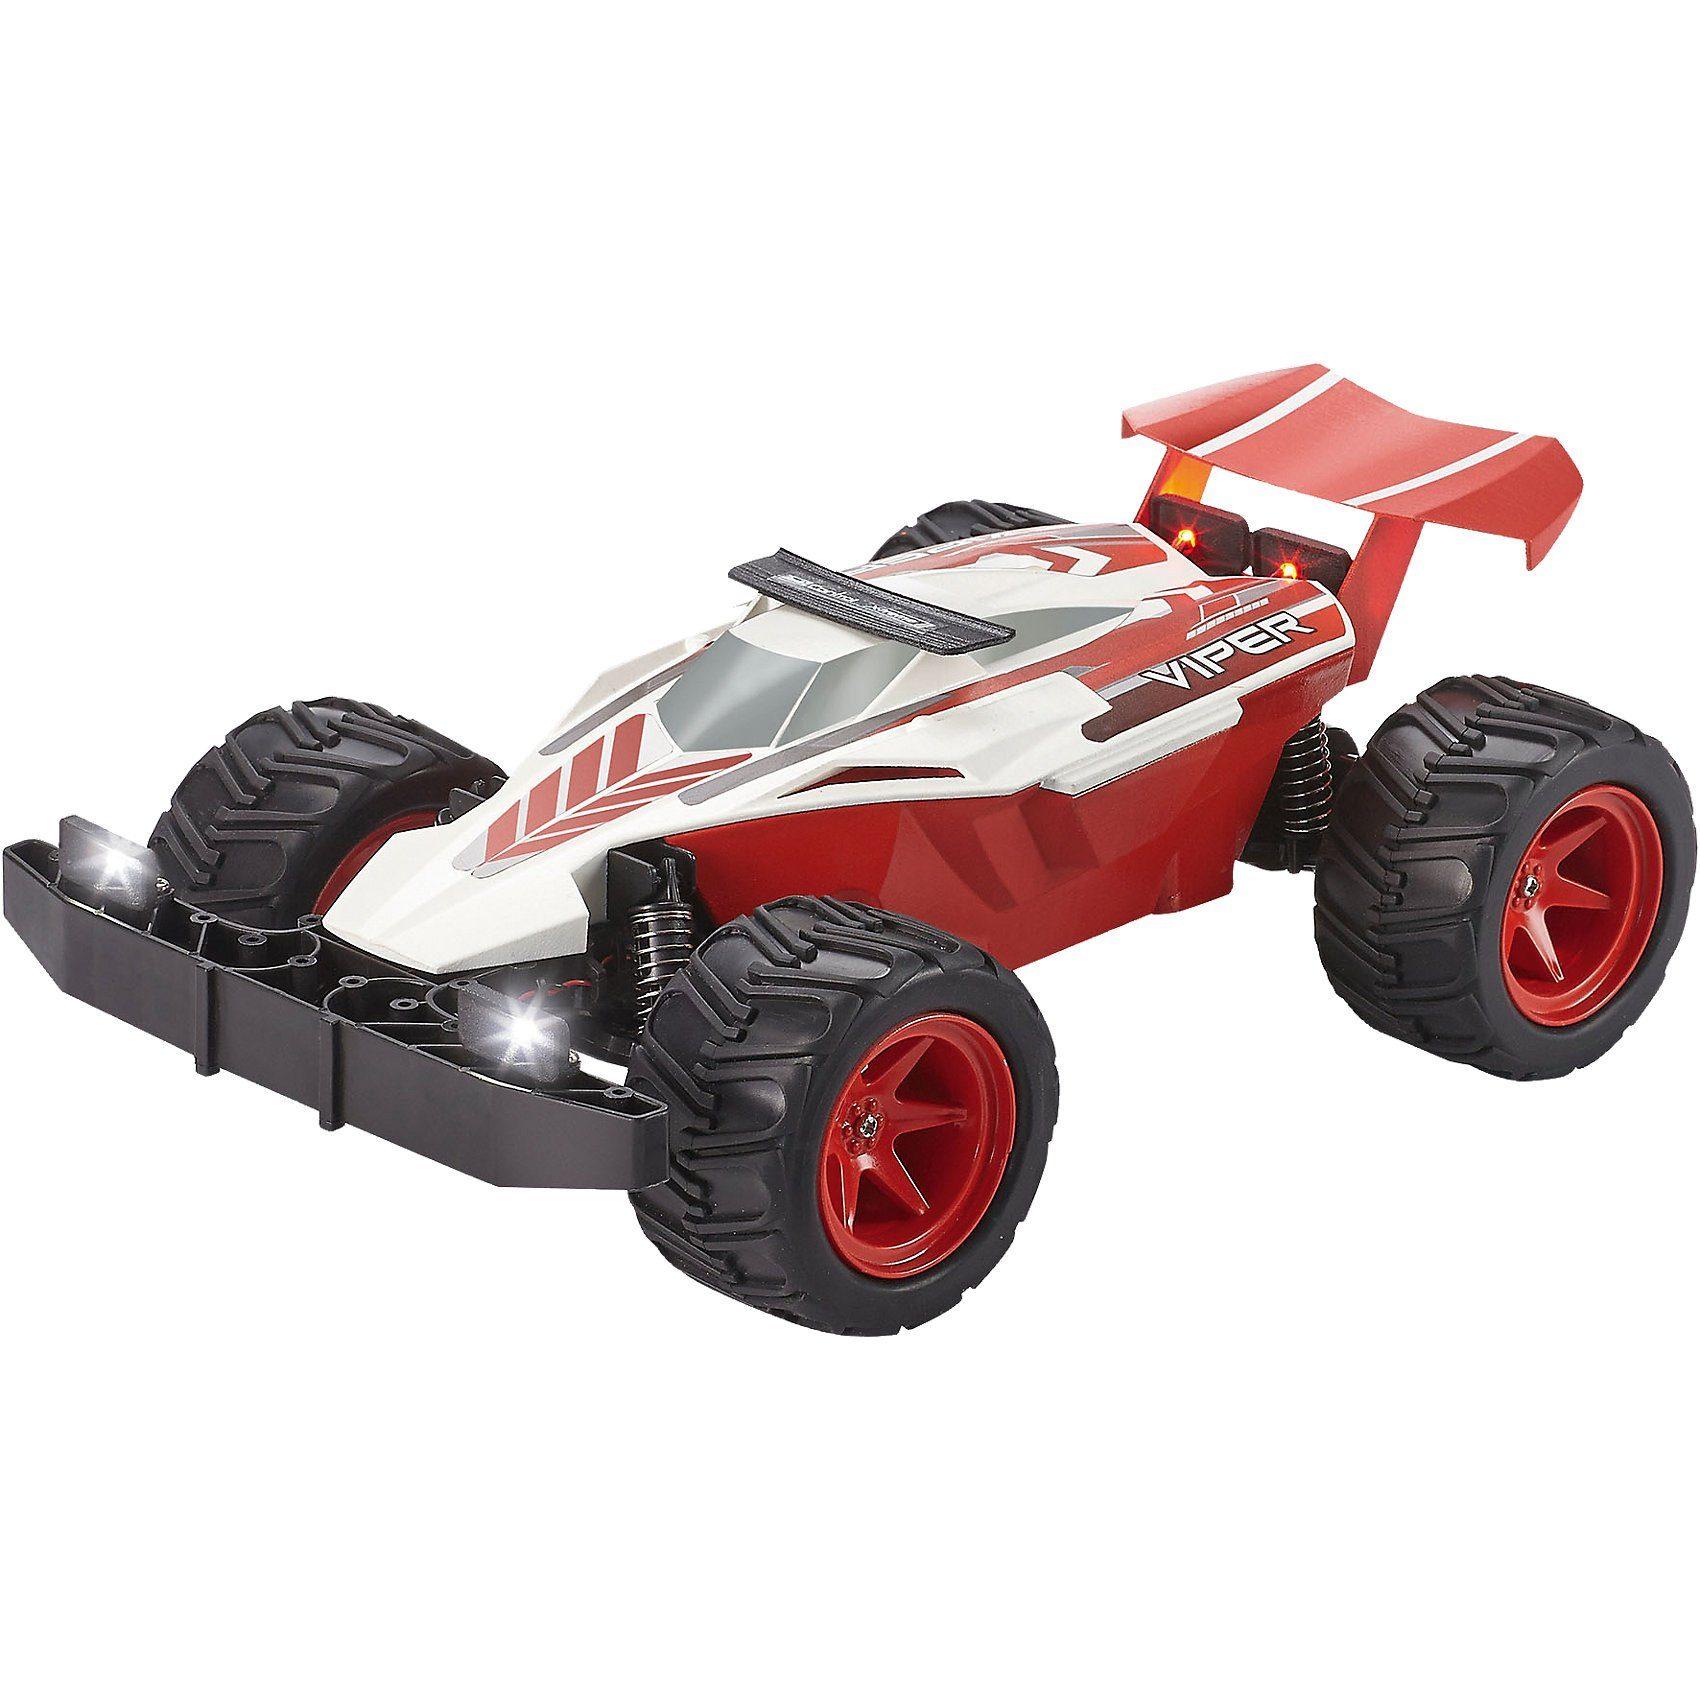 Revell X-treme RC Fahrzeug Buggy Viper